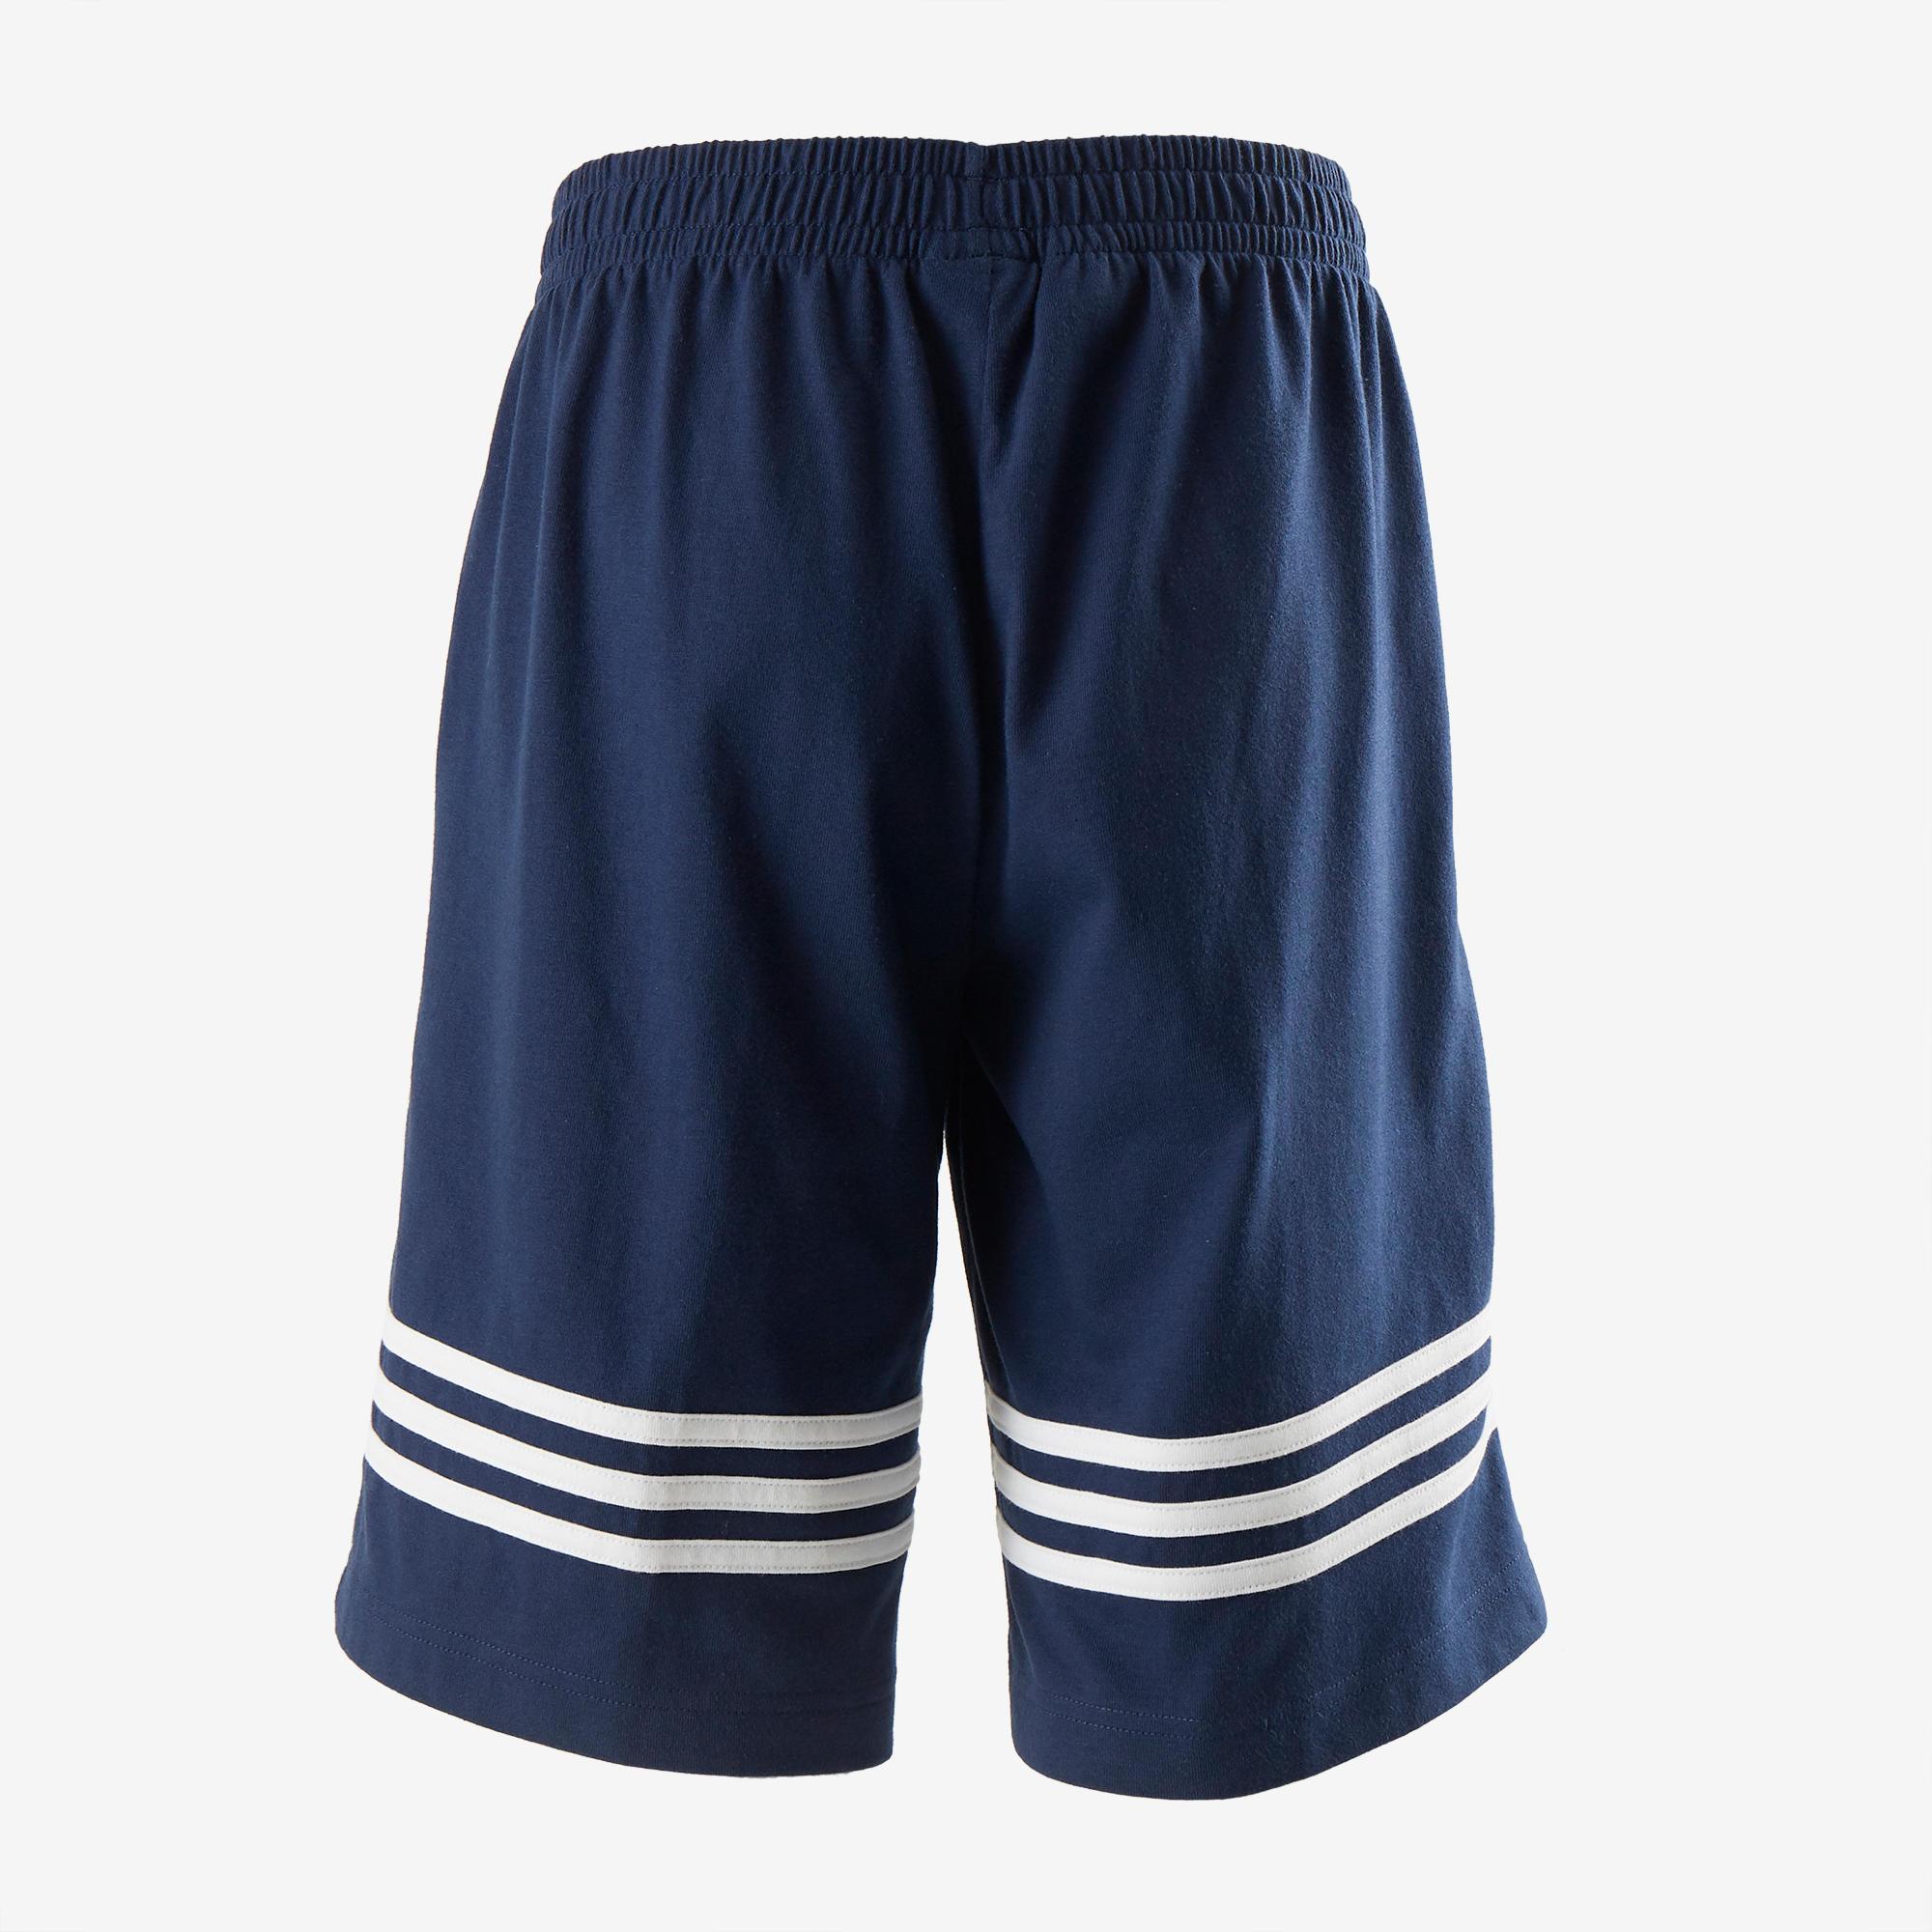 Bolsillos Gimnasia Y Azul Adidas Pantalón Niño De Algodón Corto nwCqCYU6 ee89fc071a63